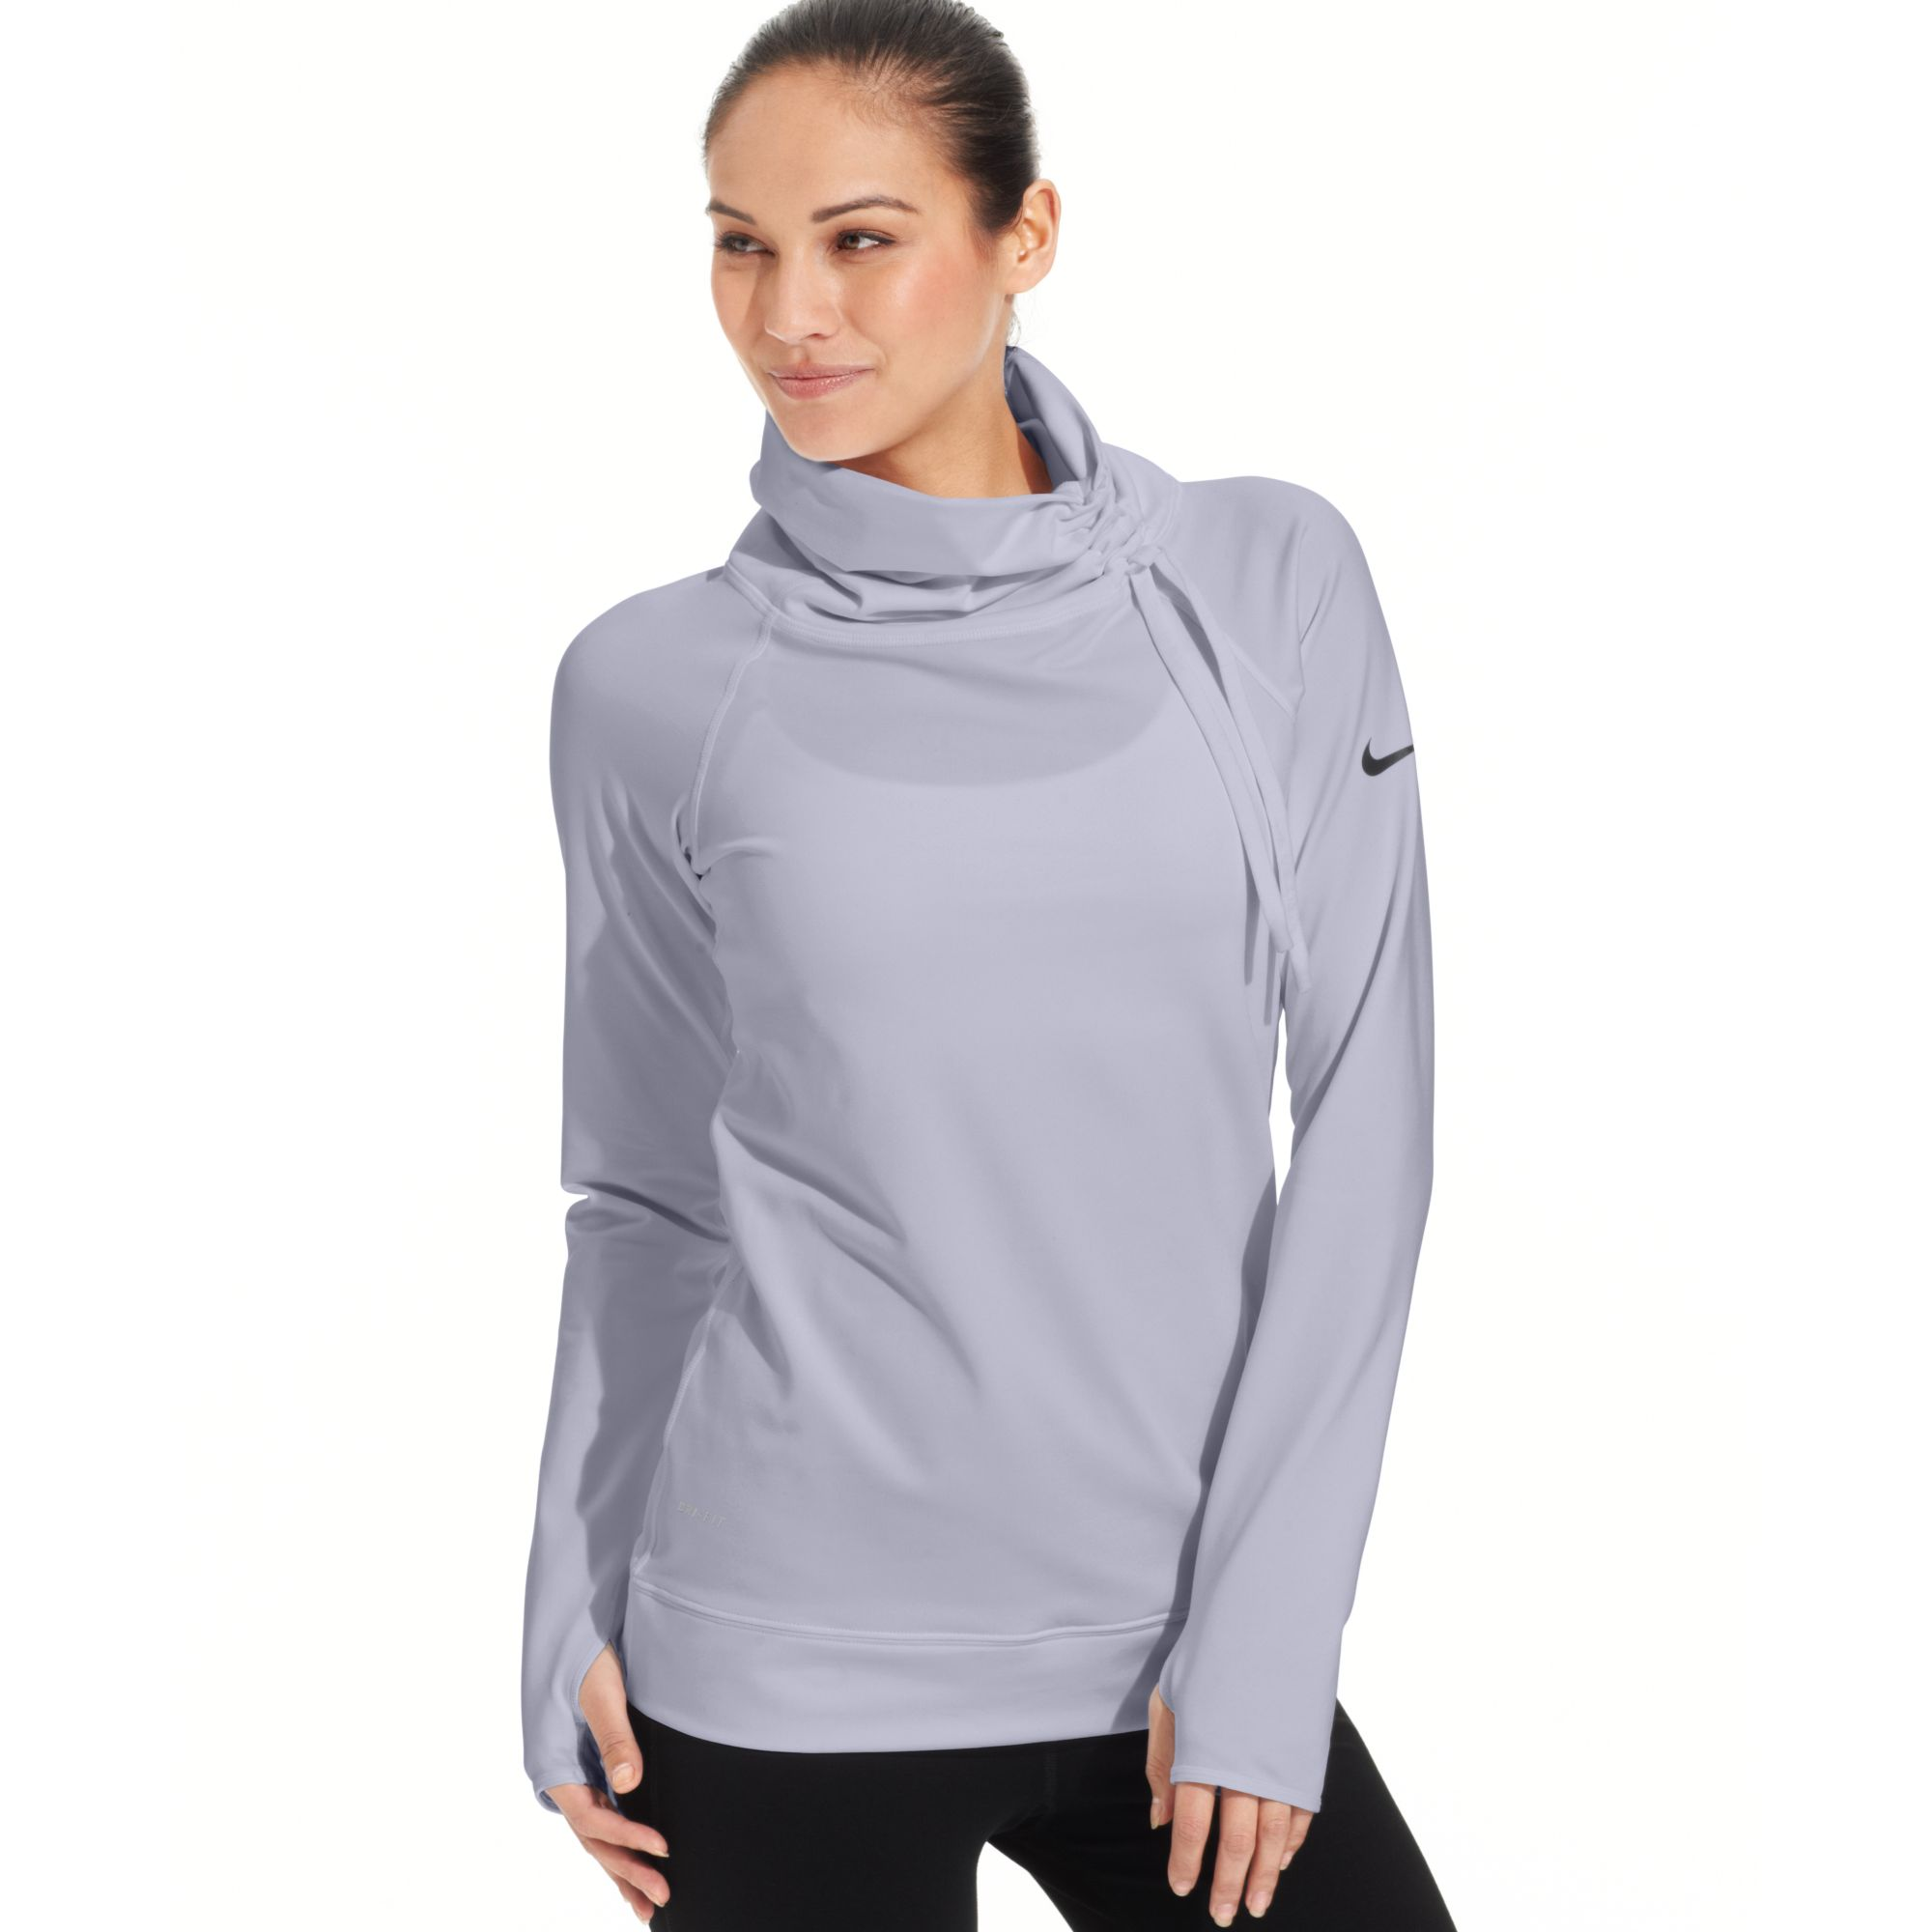 Womens Dri Fit Long Sleeve Shirts